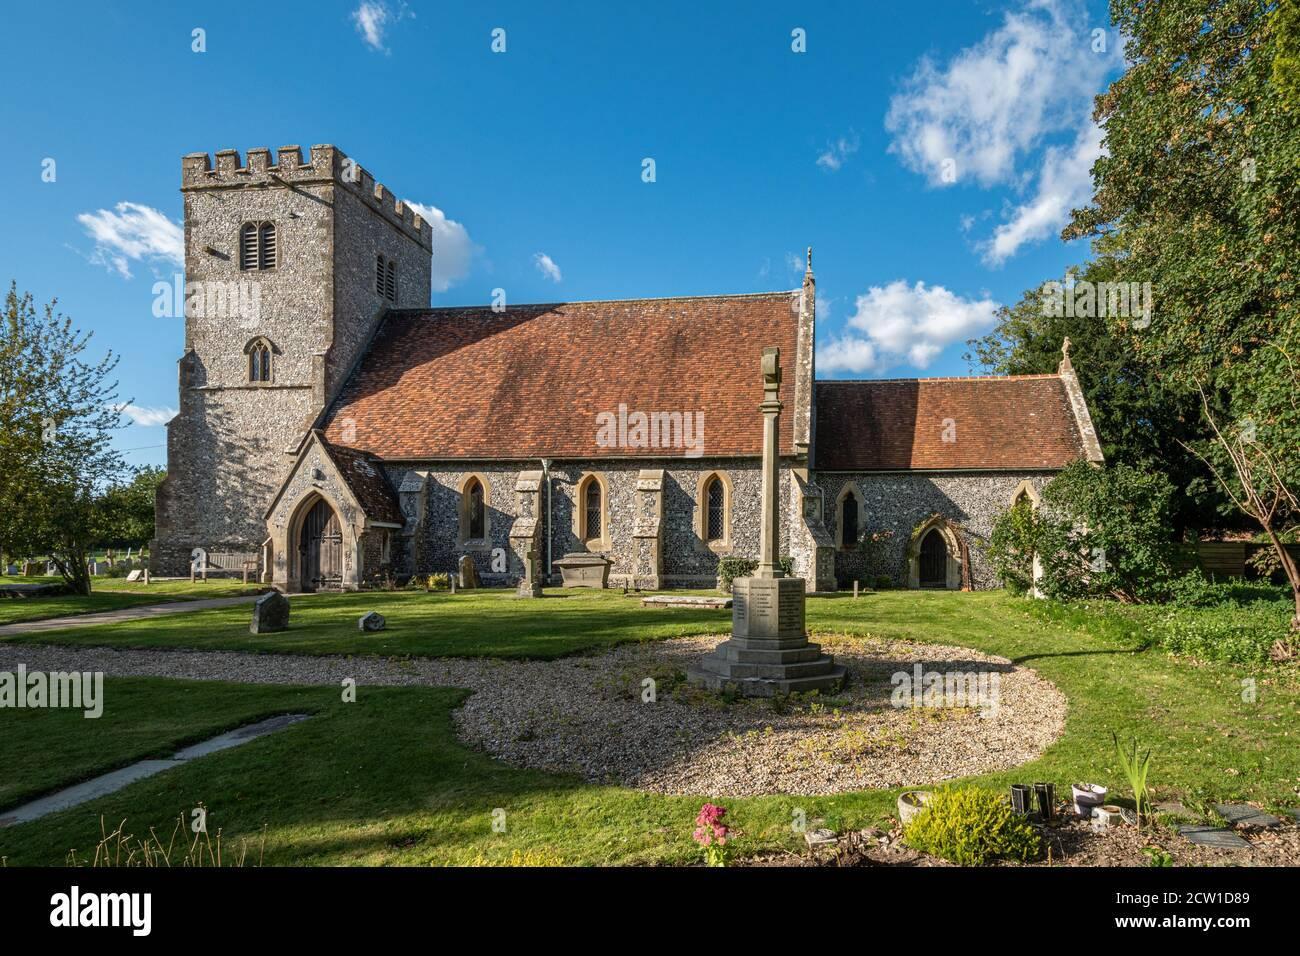 Saint Mary and Saint Nicholas Church in the village of Compton, Berkshire, UK Stock Photo